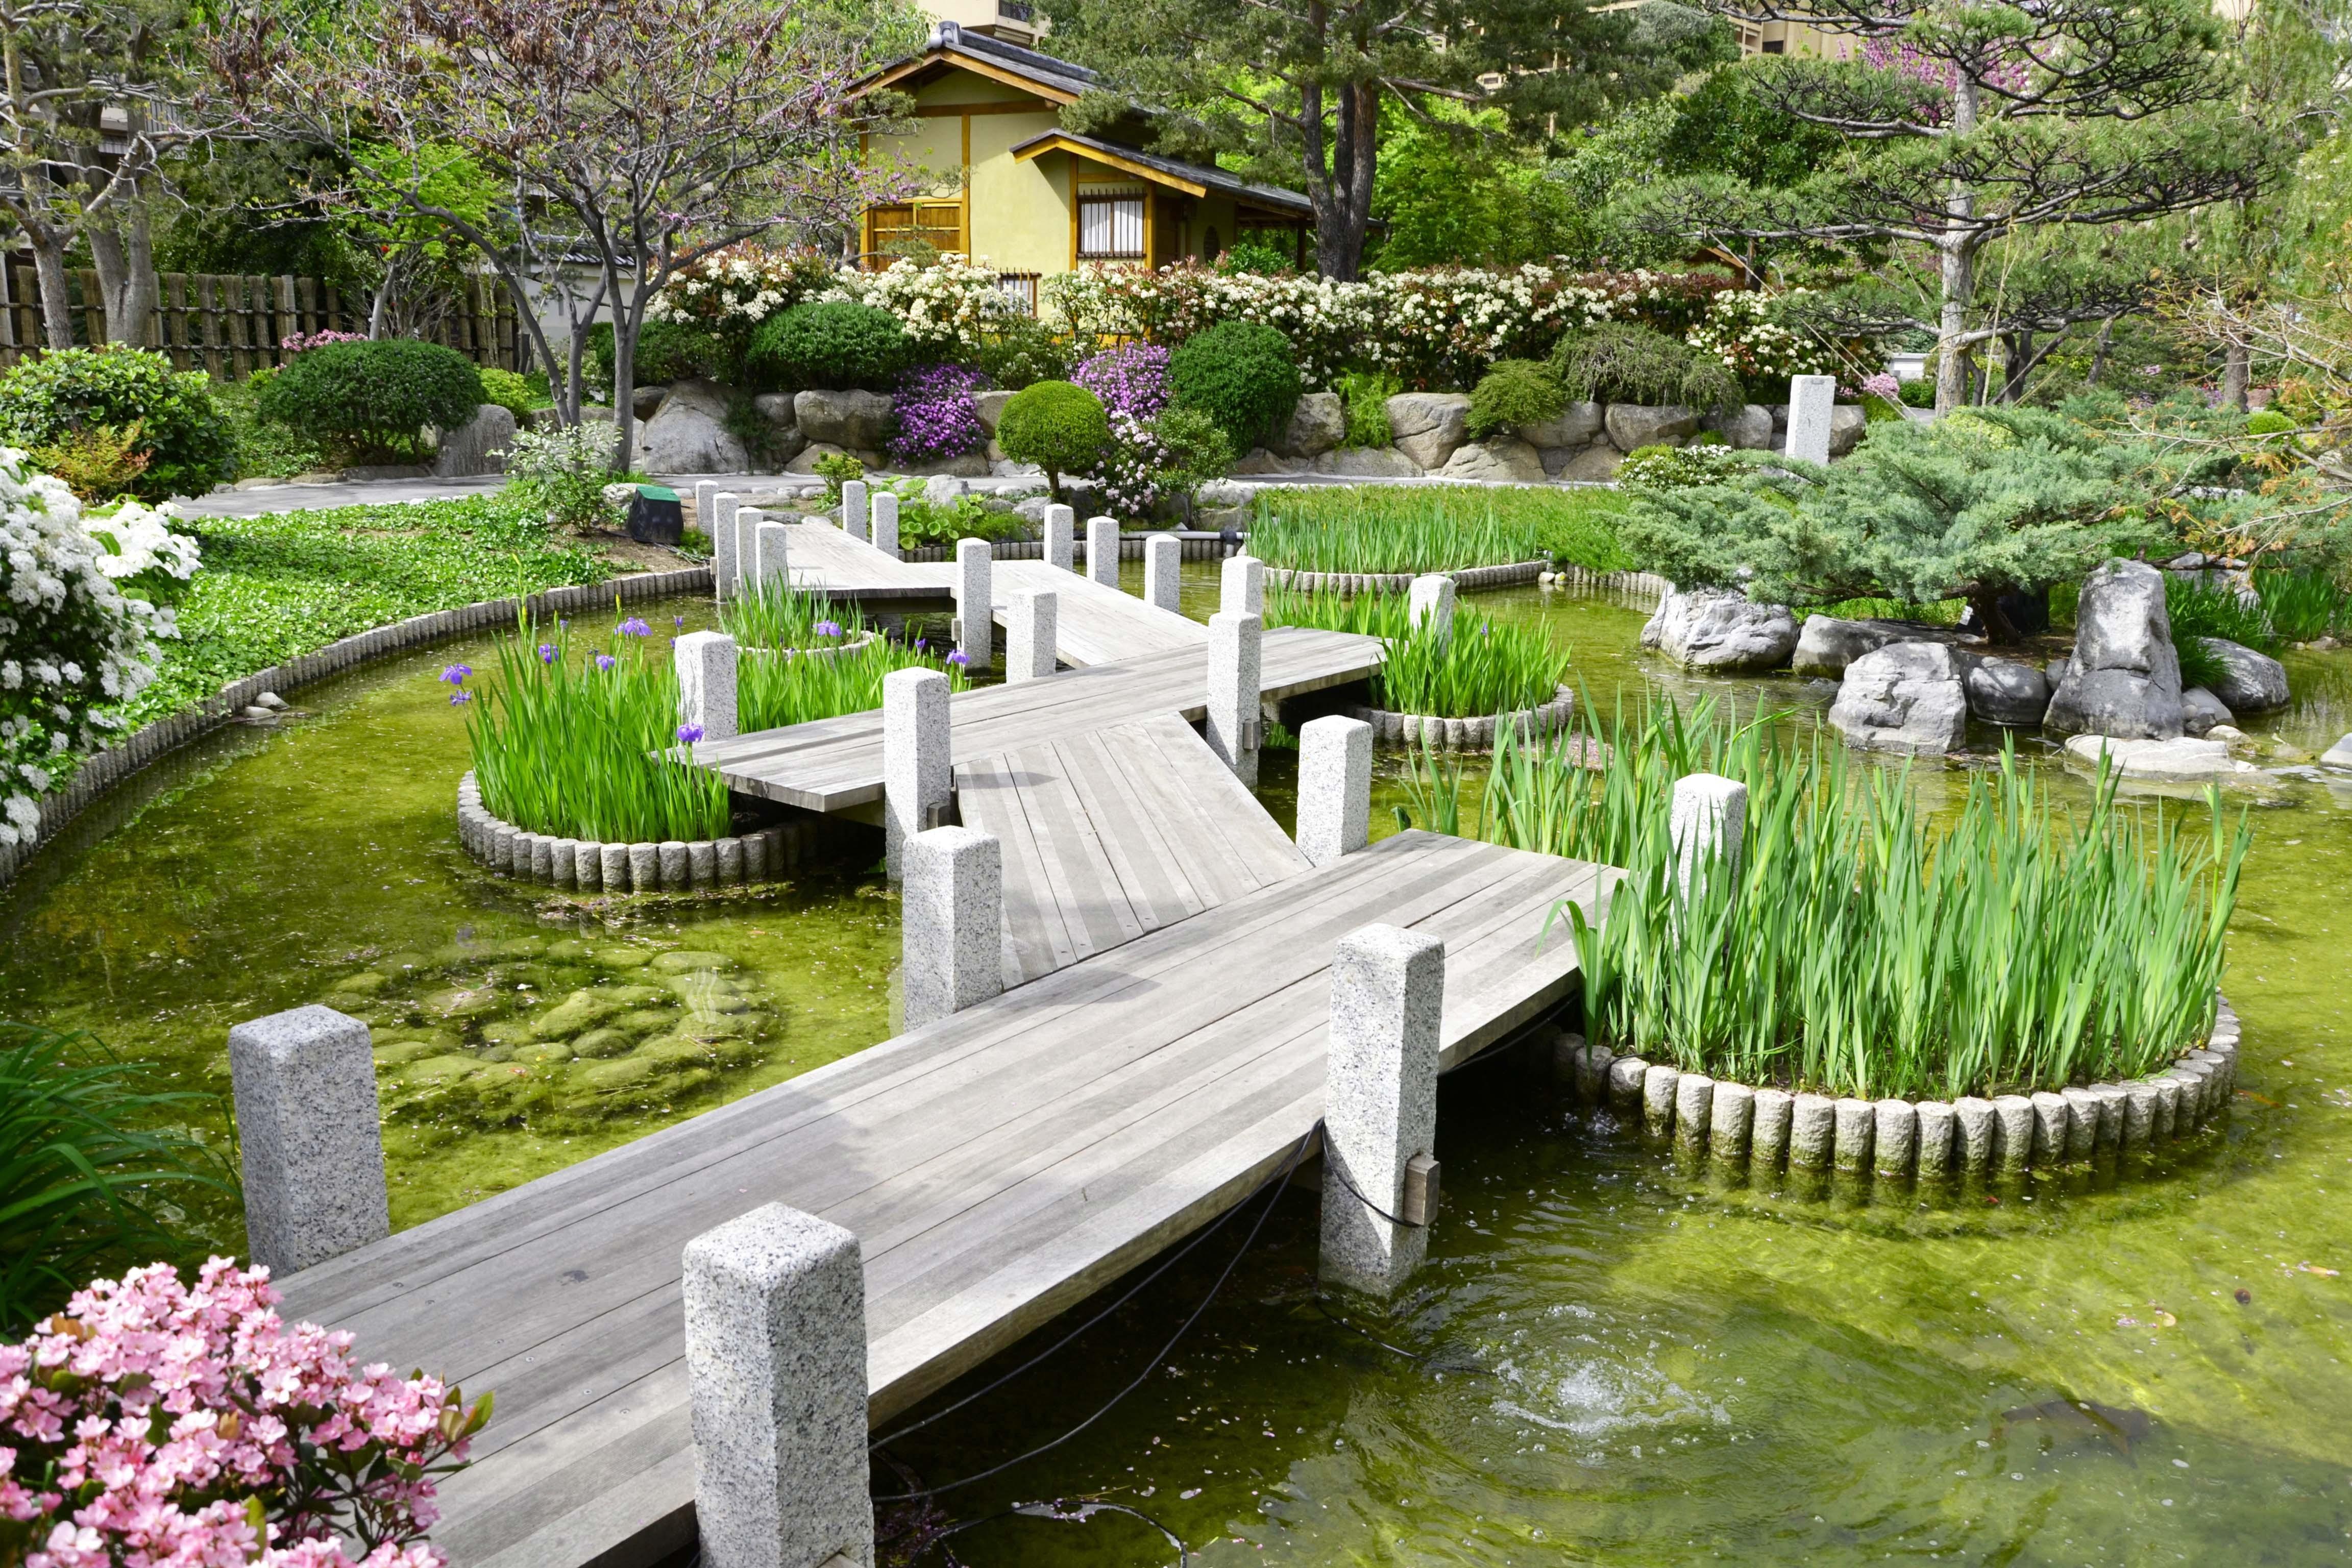 Jardin japonais de monaco for Jardin 7 17 acapulco